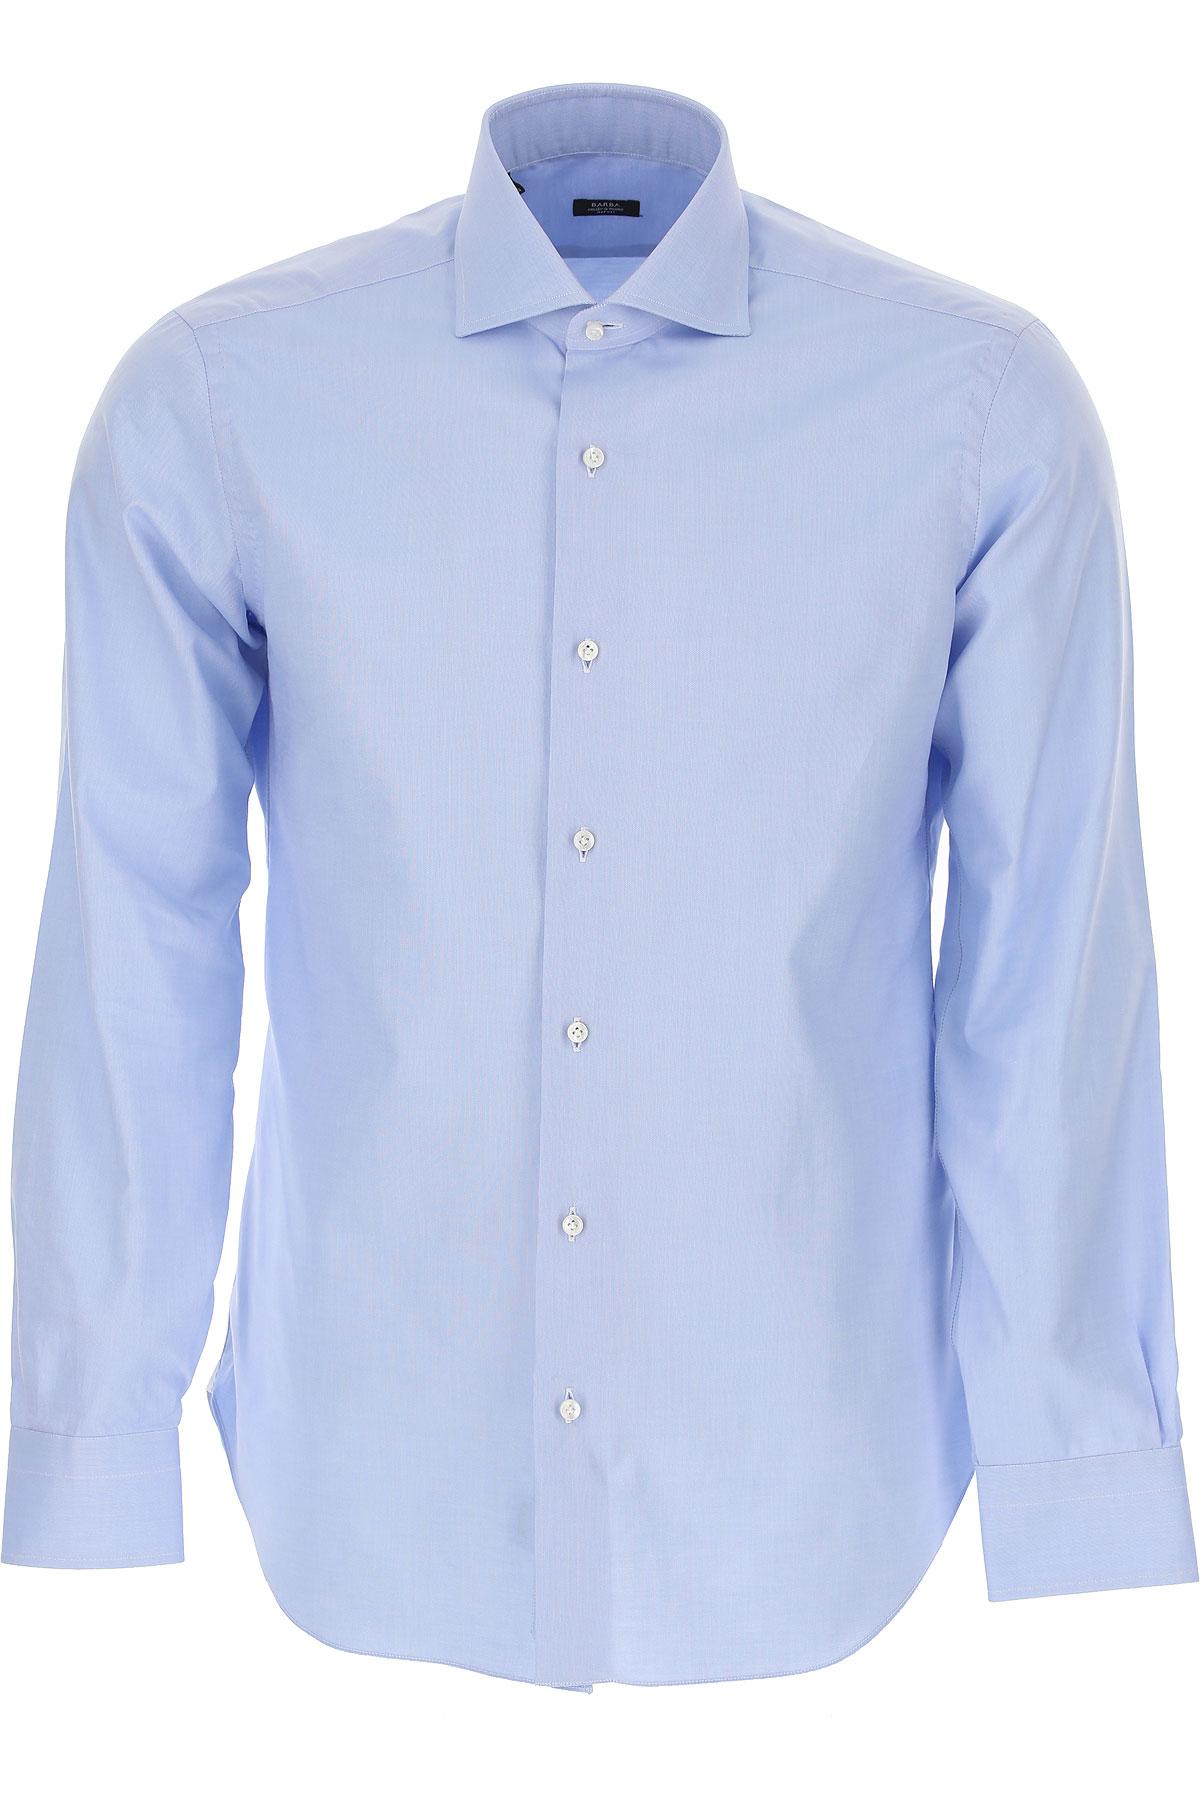 Barba Shirt for Men On Sale, Sky Blue, Cotton, 2019, 15.75 16.5